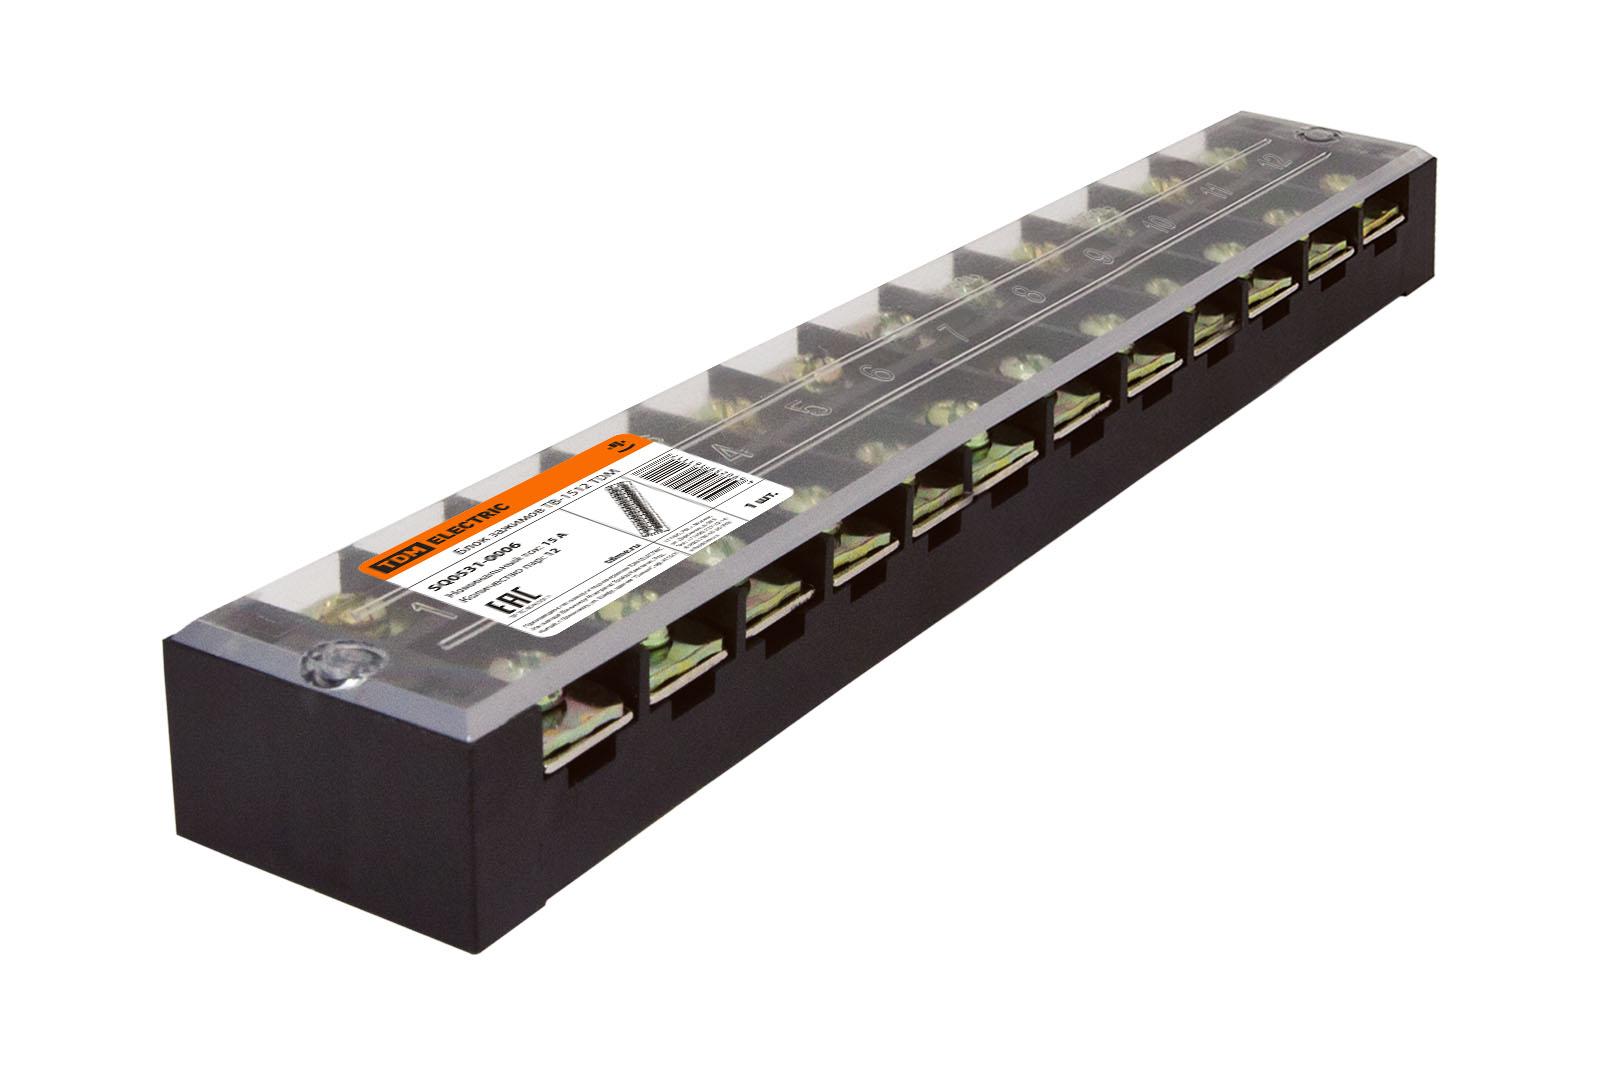 Зажим Tdm Sq0531-0006 tdm electric smd5050 60 20 12 144 3200 ip20 sq0331 0006